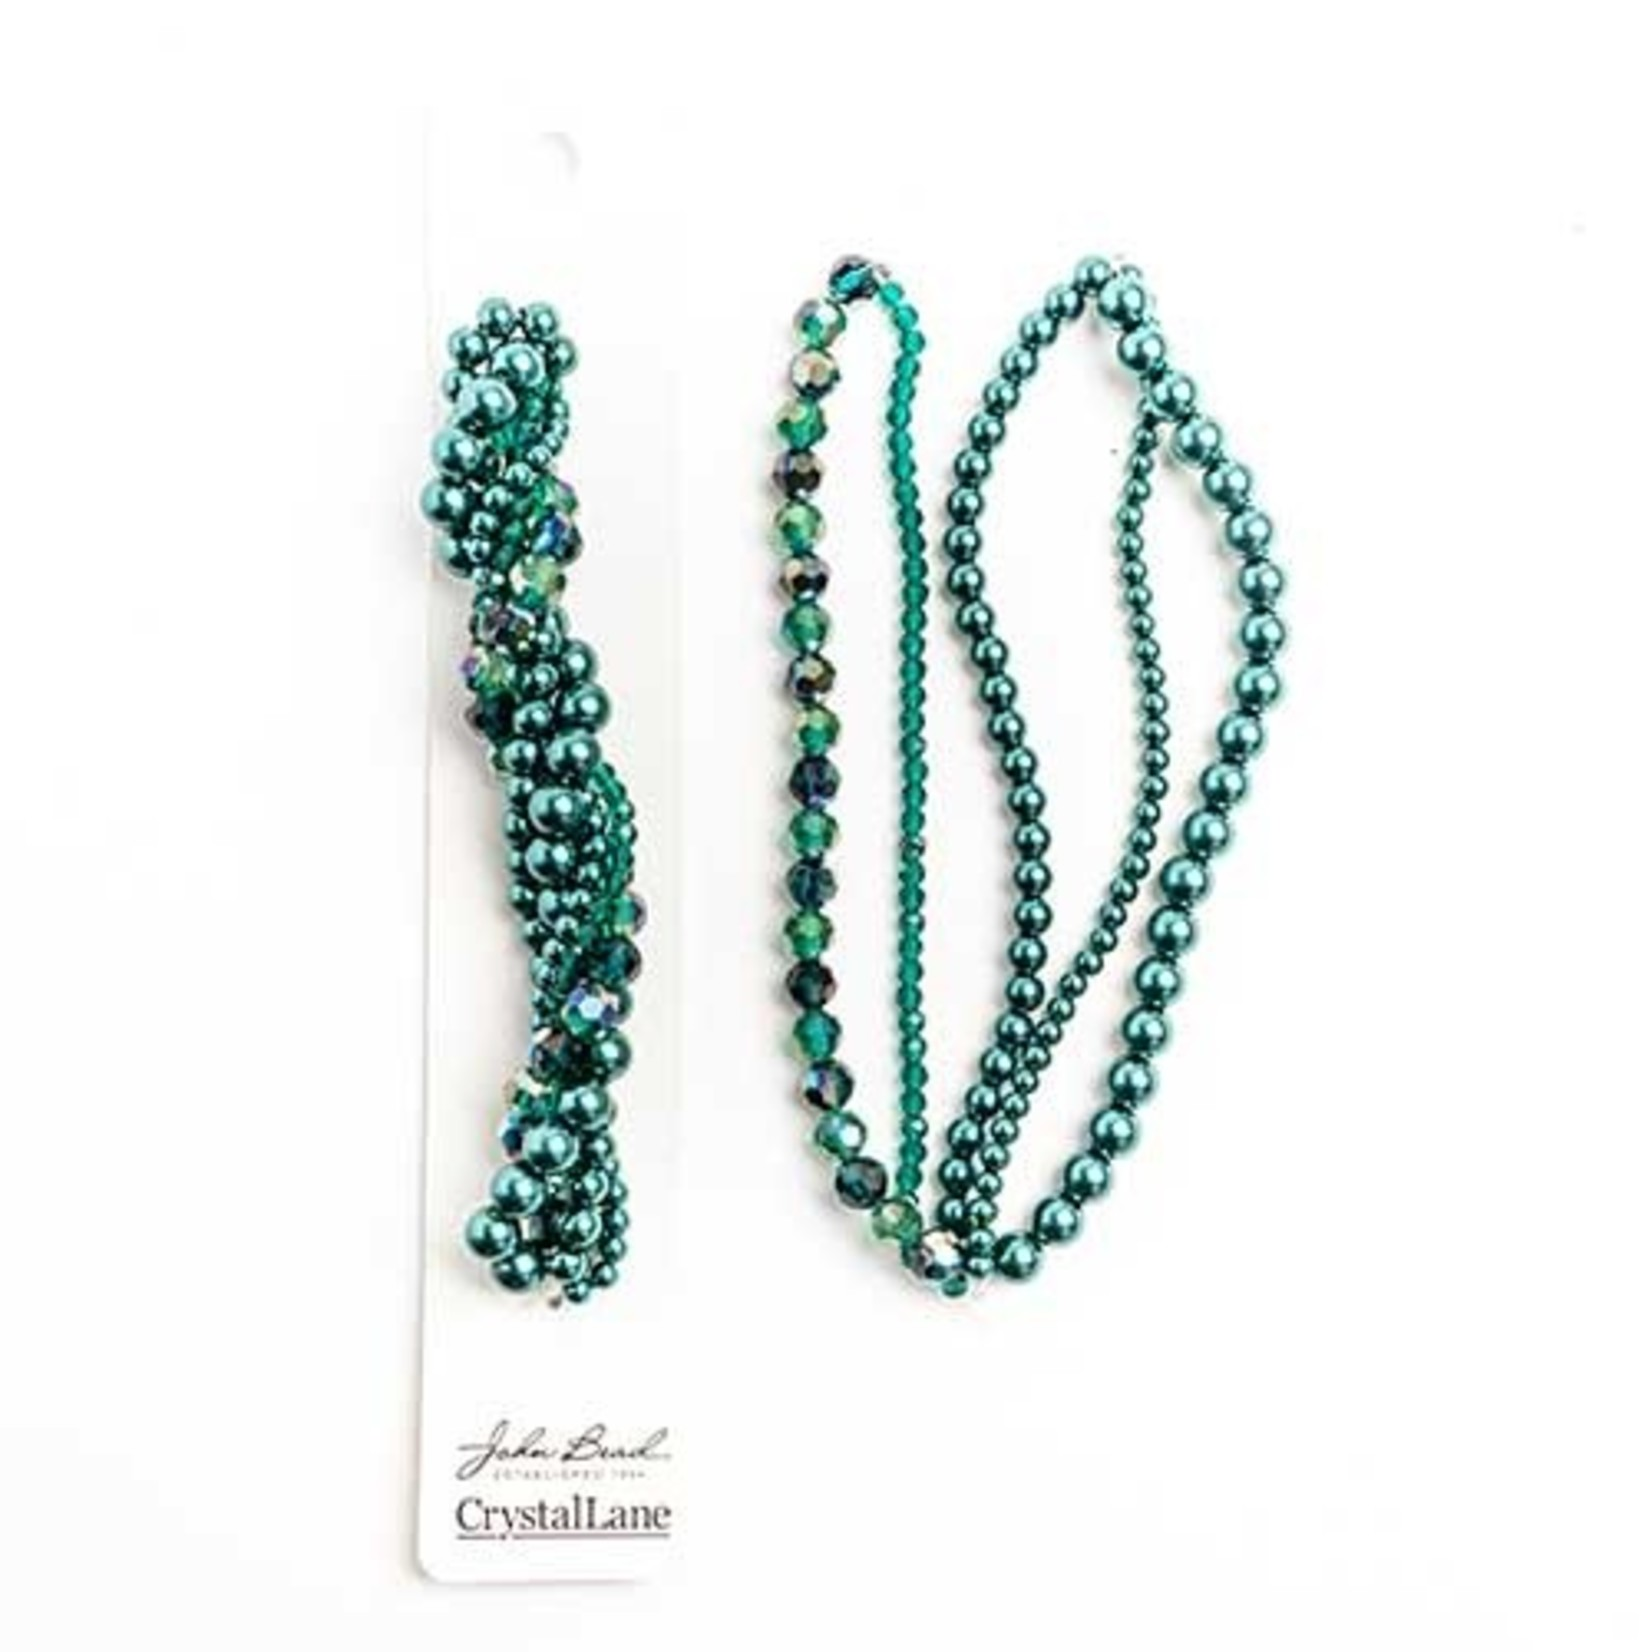 Crystal Lane Twisted Bead Strands Teal Hydrangea